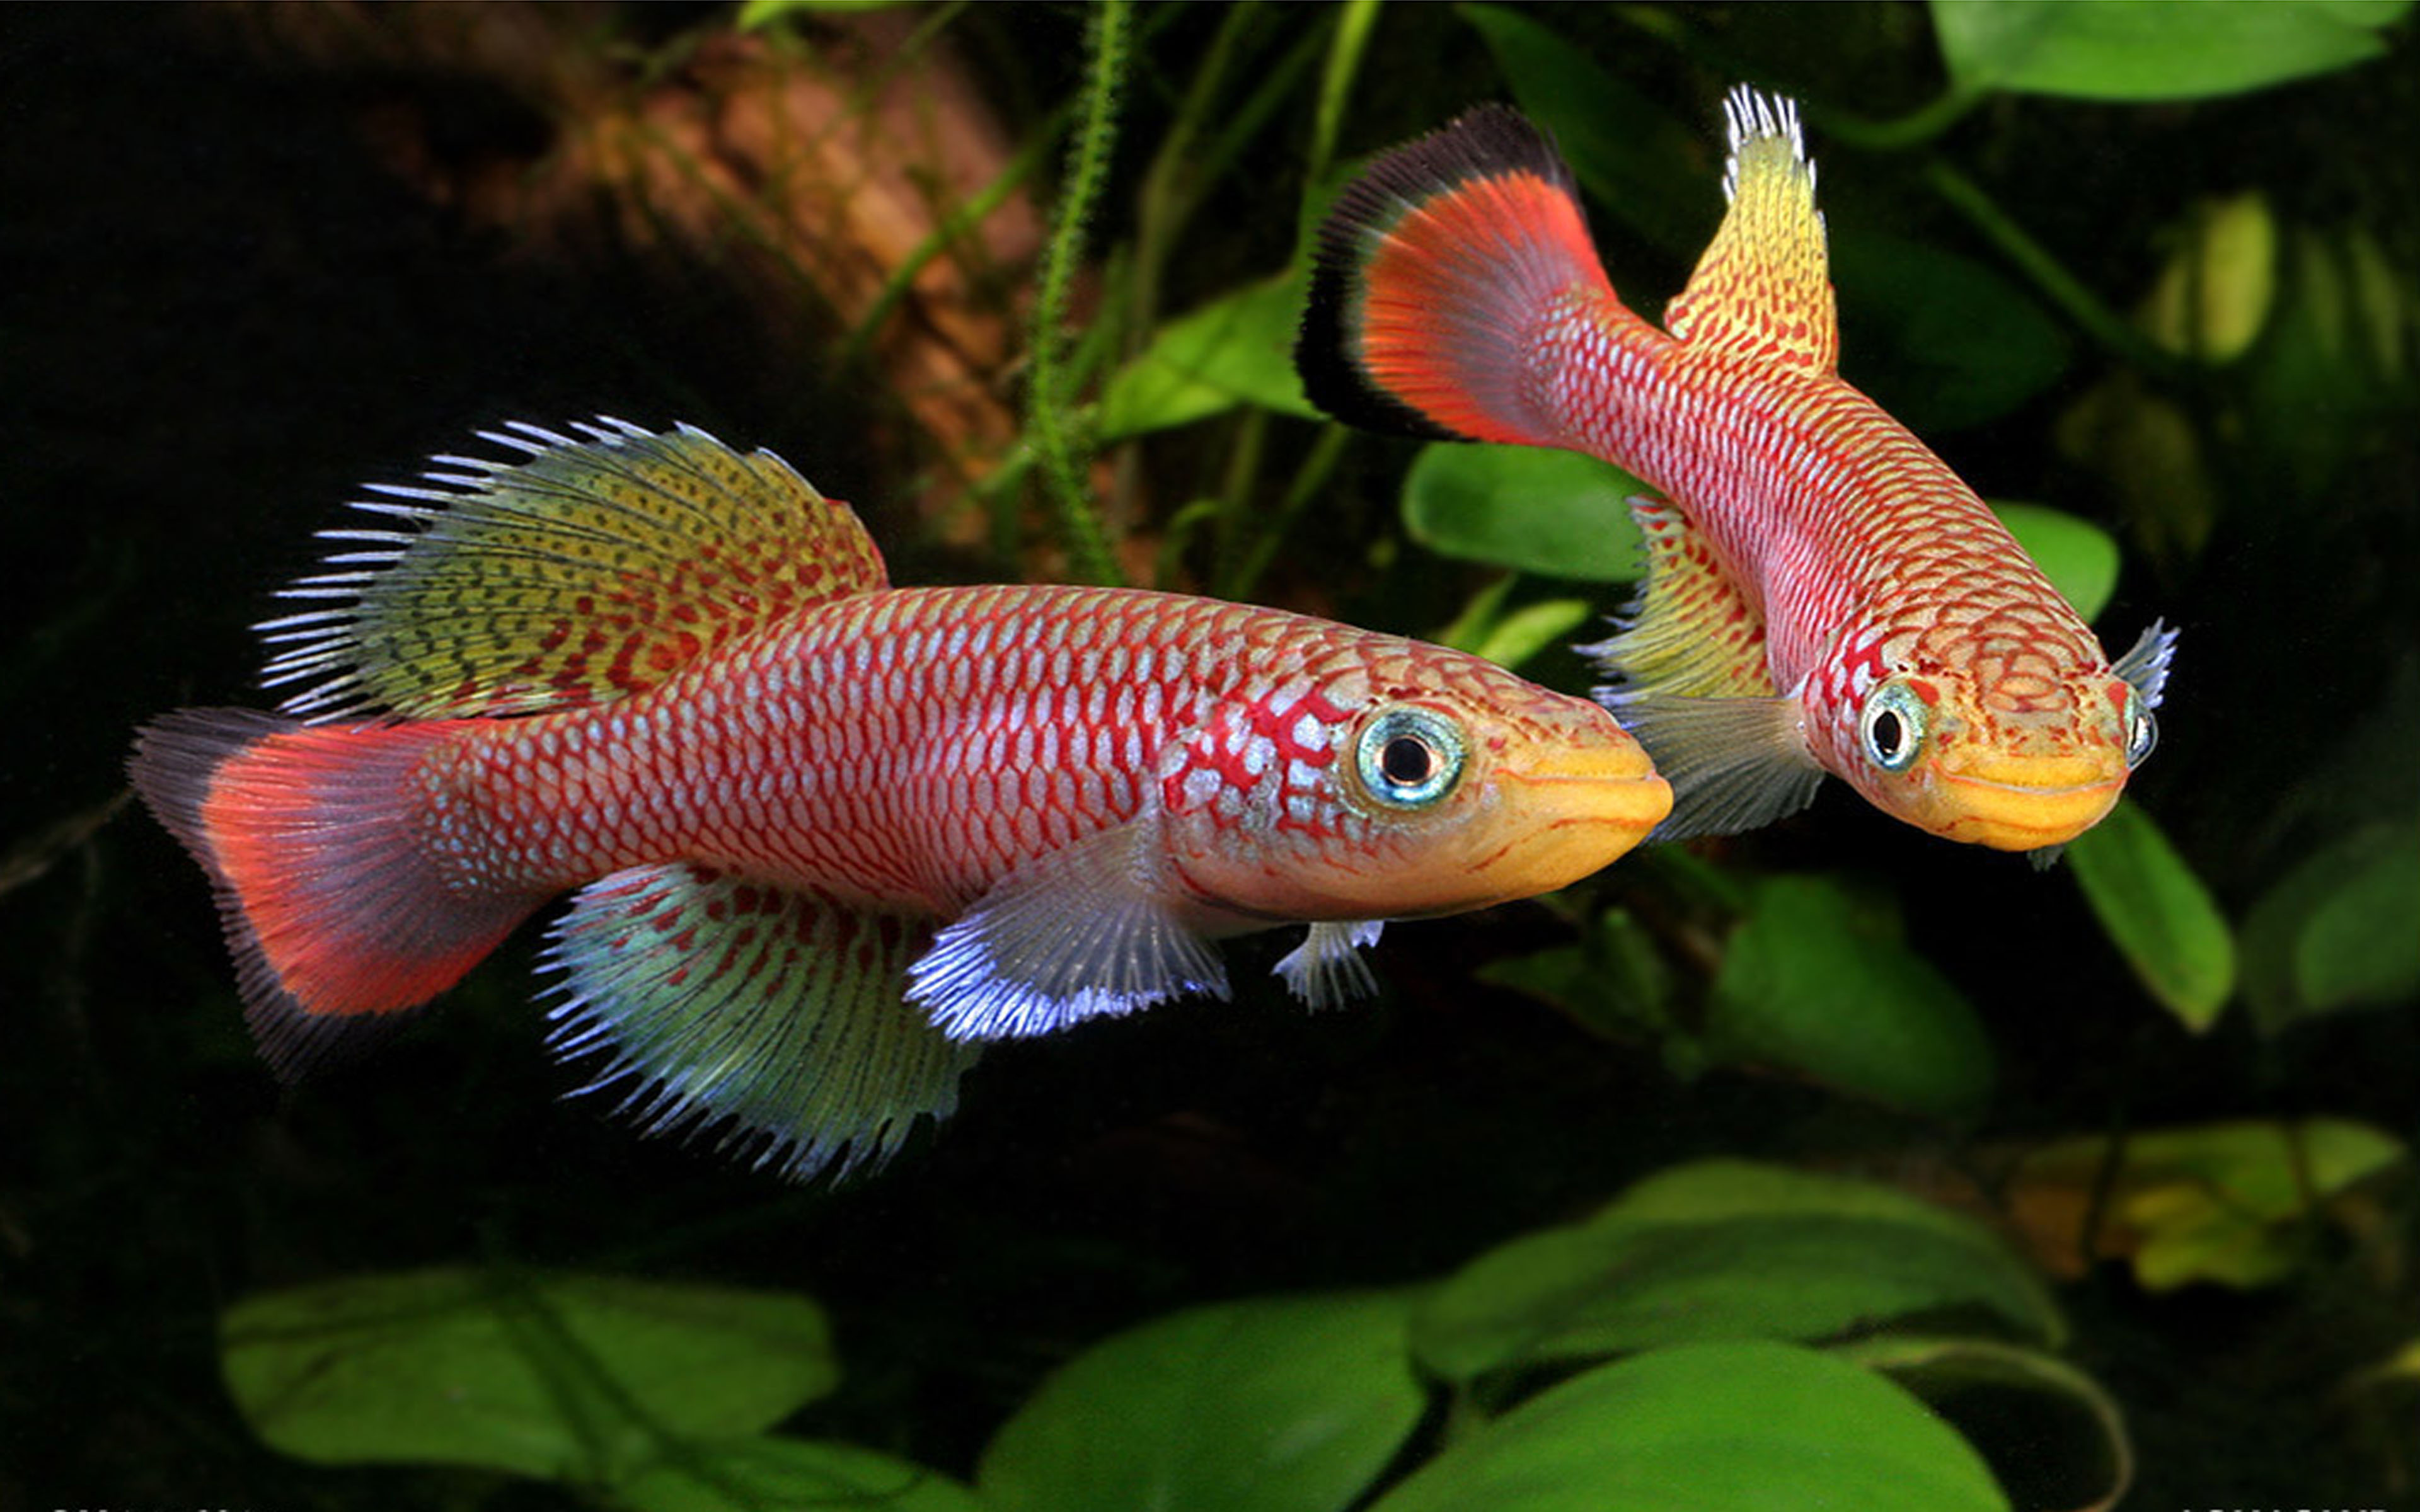 How To Get An Animated Wallpaper Windows 10 Tropical Freshwater Species Killifish Dekstop Wallpaper Hd